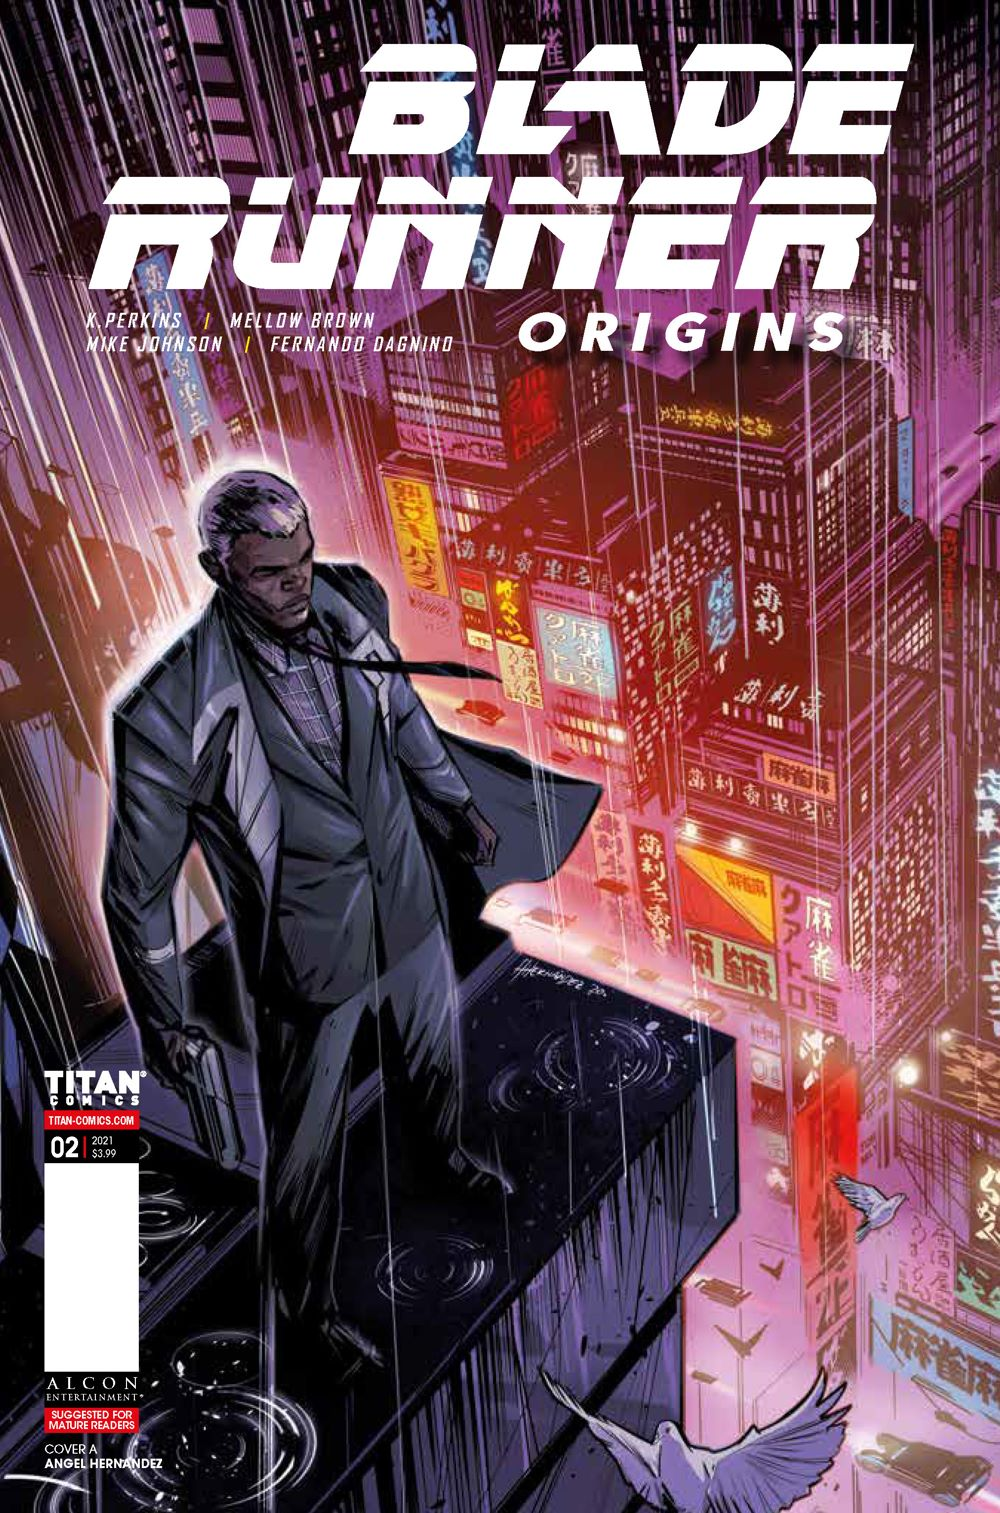 Blade_Runner_Origins_2_COVER-A_-HERNANDEZ ComicList Previews: BLADE RUNNER ORIGINS #2